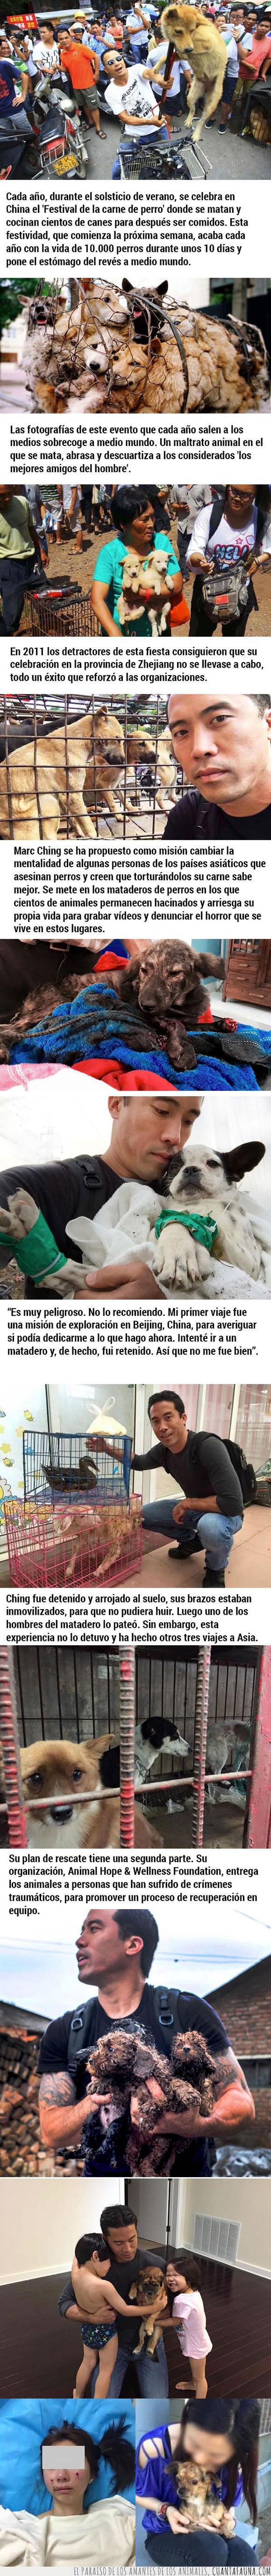 china,festival,marc ching,perros,salvador